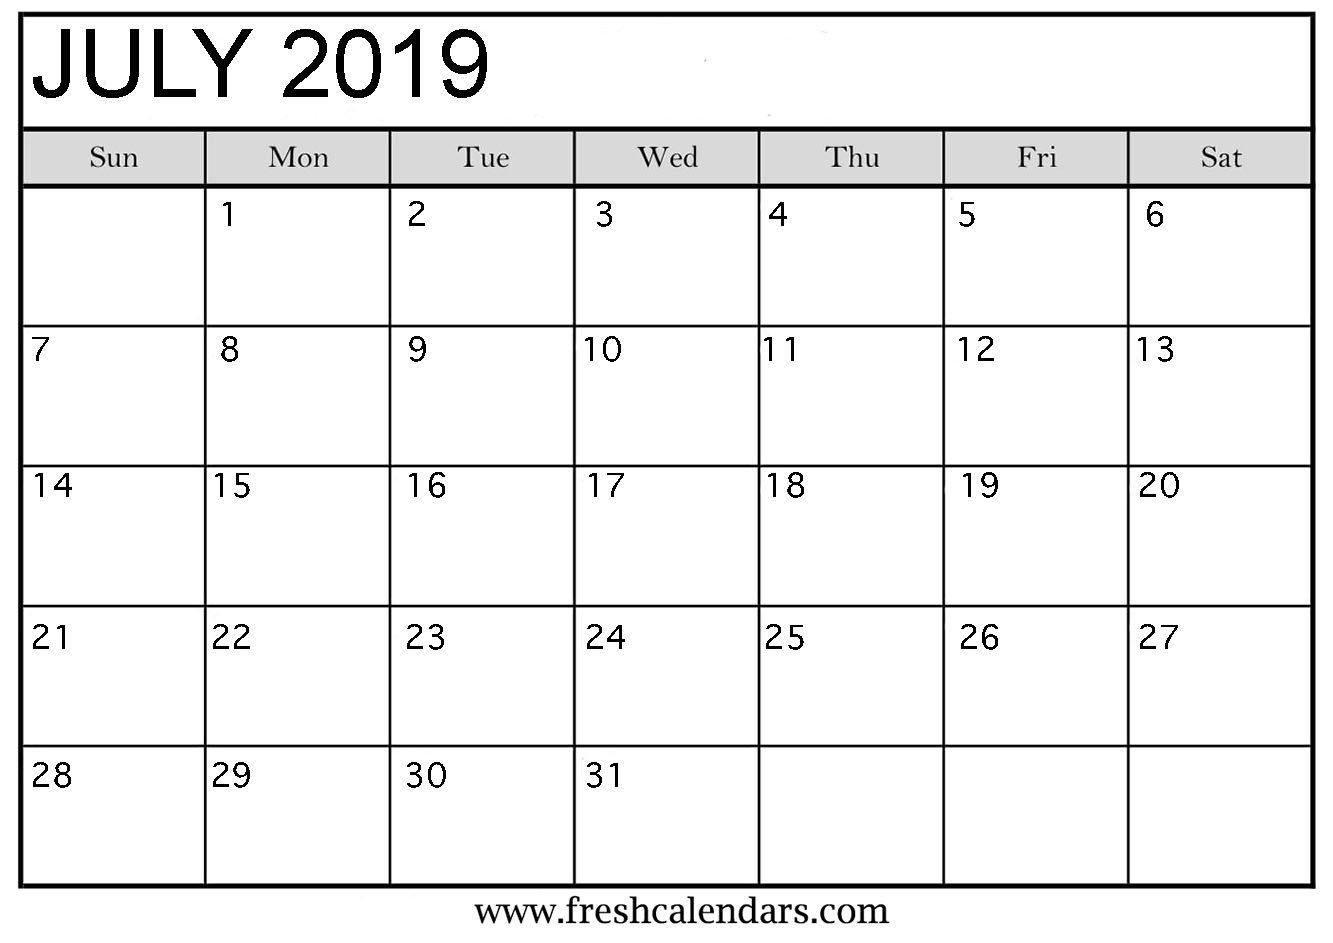 Calendar Template for Word July 2019 Calendar Printable Fresh Calendars